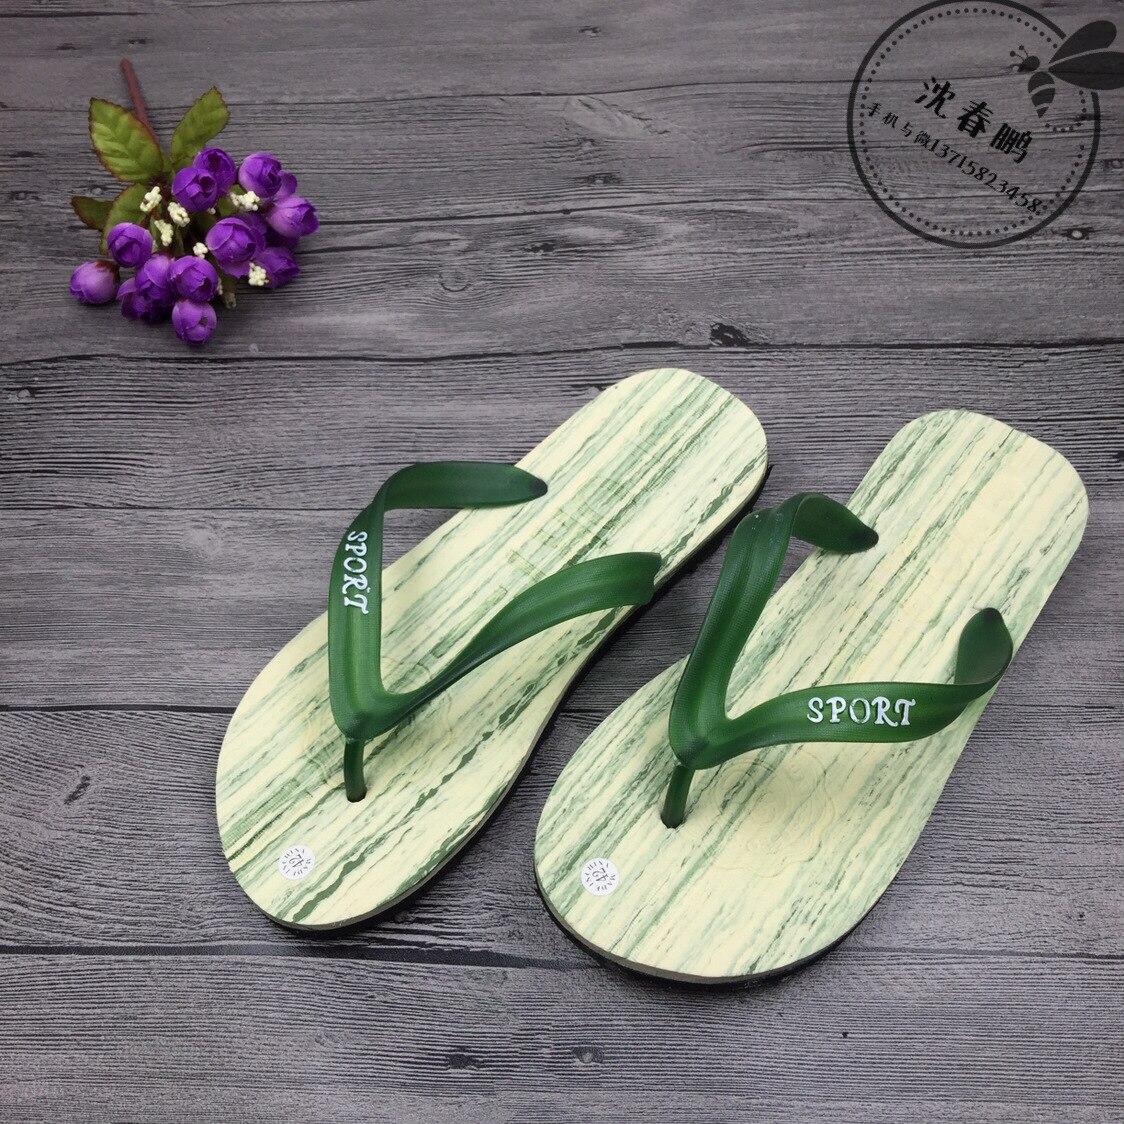 beach slippers men Flip flops men's new summer imitation wood grain men's home cool slippers Casual Men Flip Flops Rubber все цены